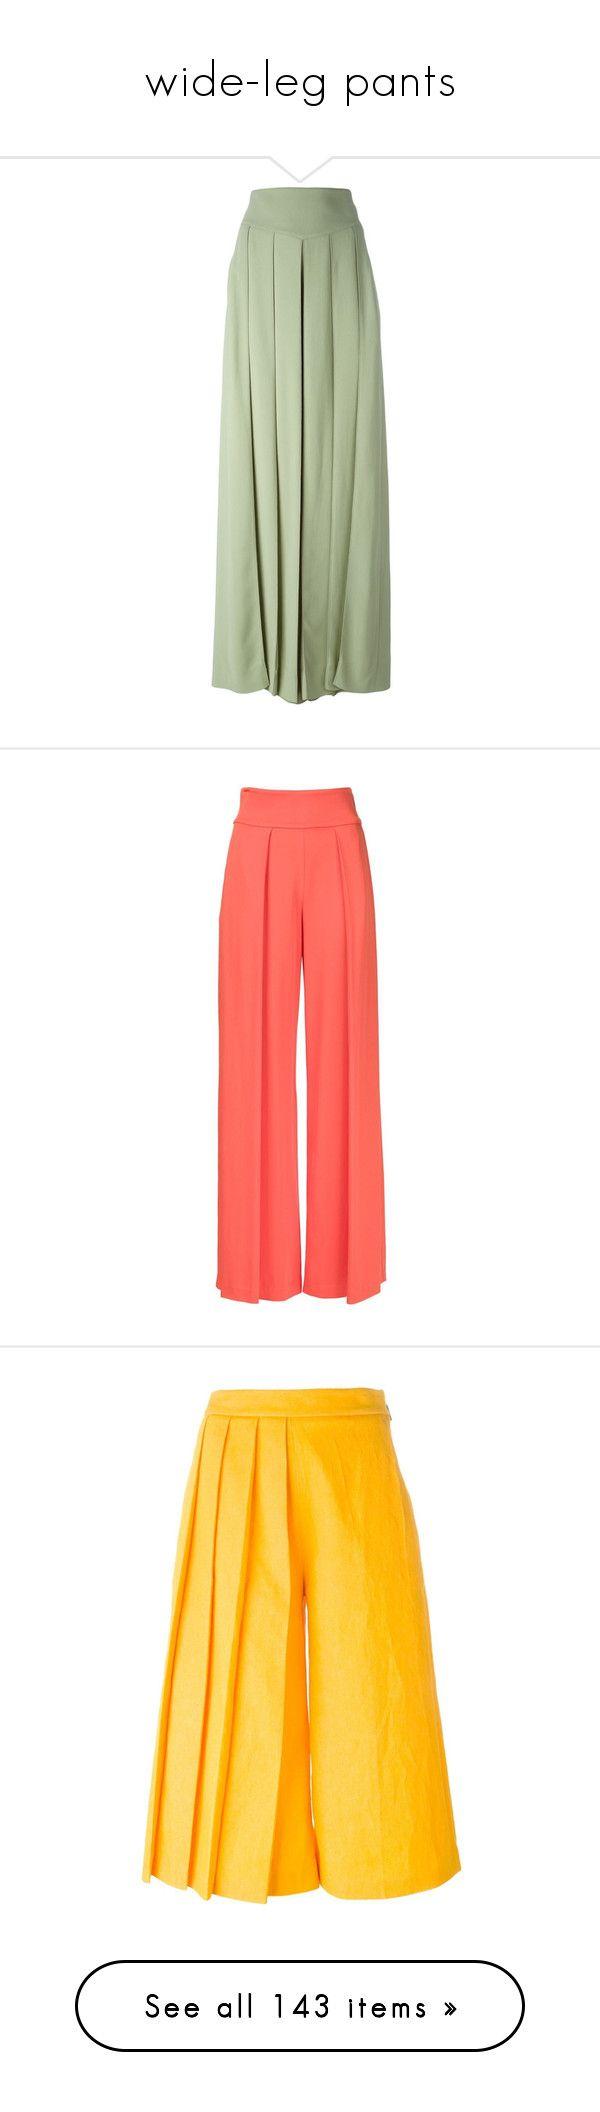 """wide-leg pants"" by bonadea007 ❤ liked on Polyvore featuring pants, skirts, trousers, maxi skirt, pantaloni, green, high waisted pleated pants, wide-leg pants, pleated wide leg trousers and high-waisted trousers"